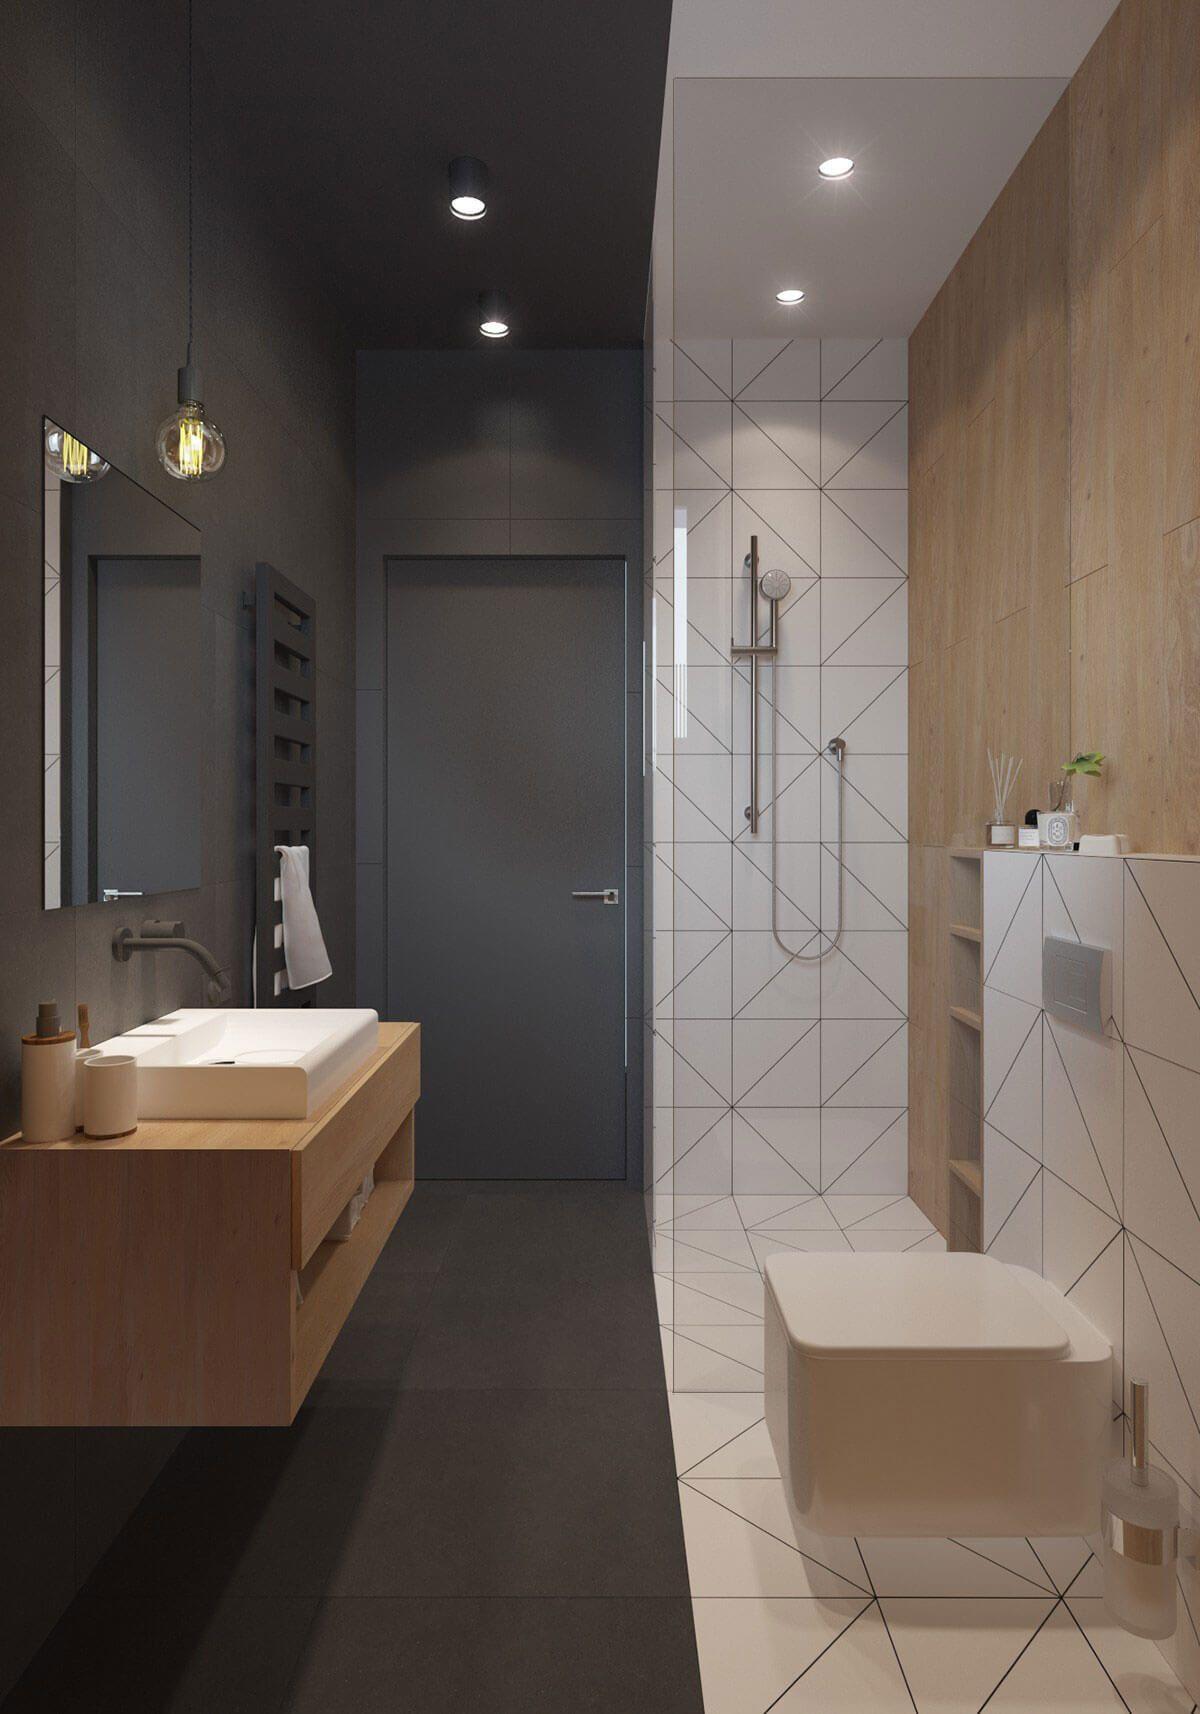 032 Modern Scandinavian Zrobym Architects Modern Bathroom Design Bathroom Interior Design Bathroom Inspiration